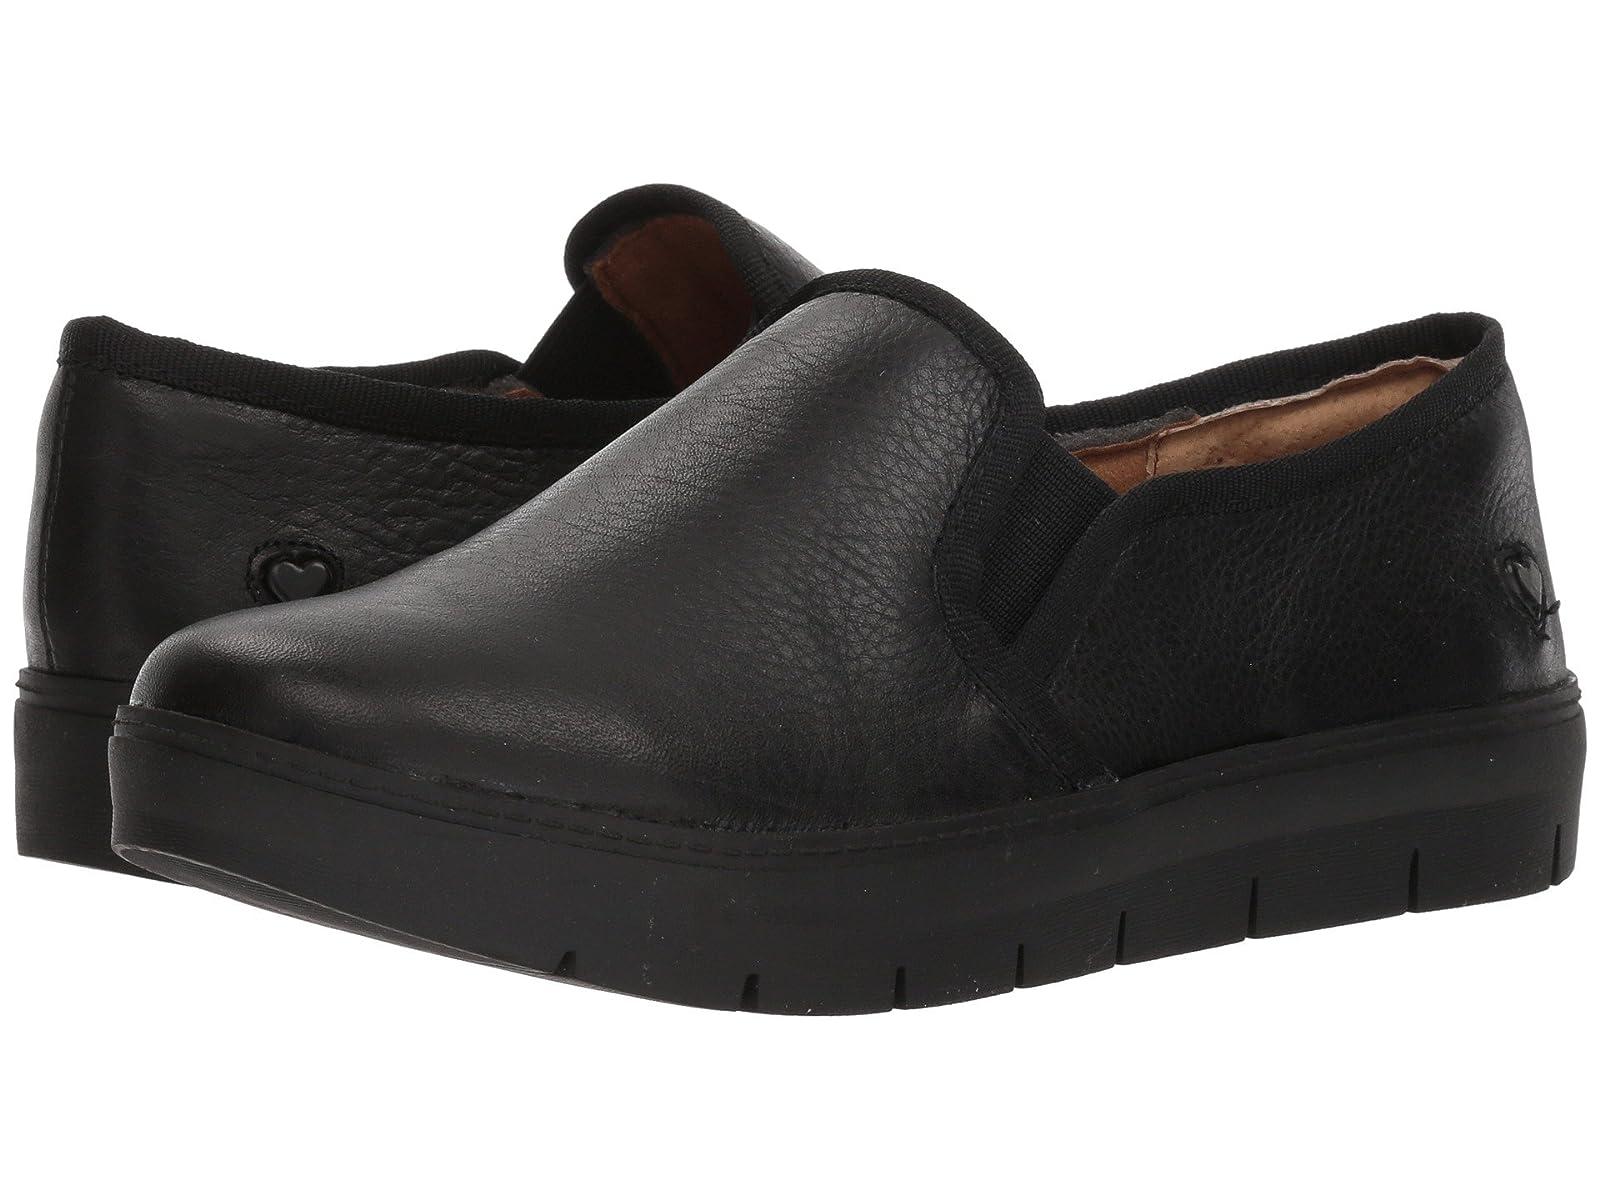 Nurse Mates AdelaAtmospheric grades have affordable shoes